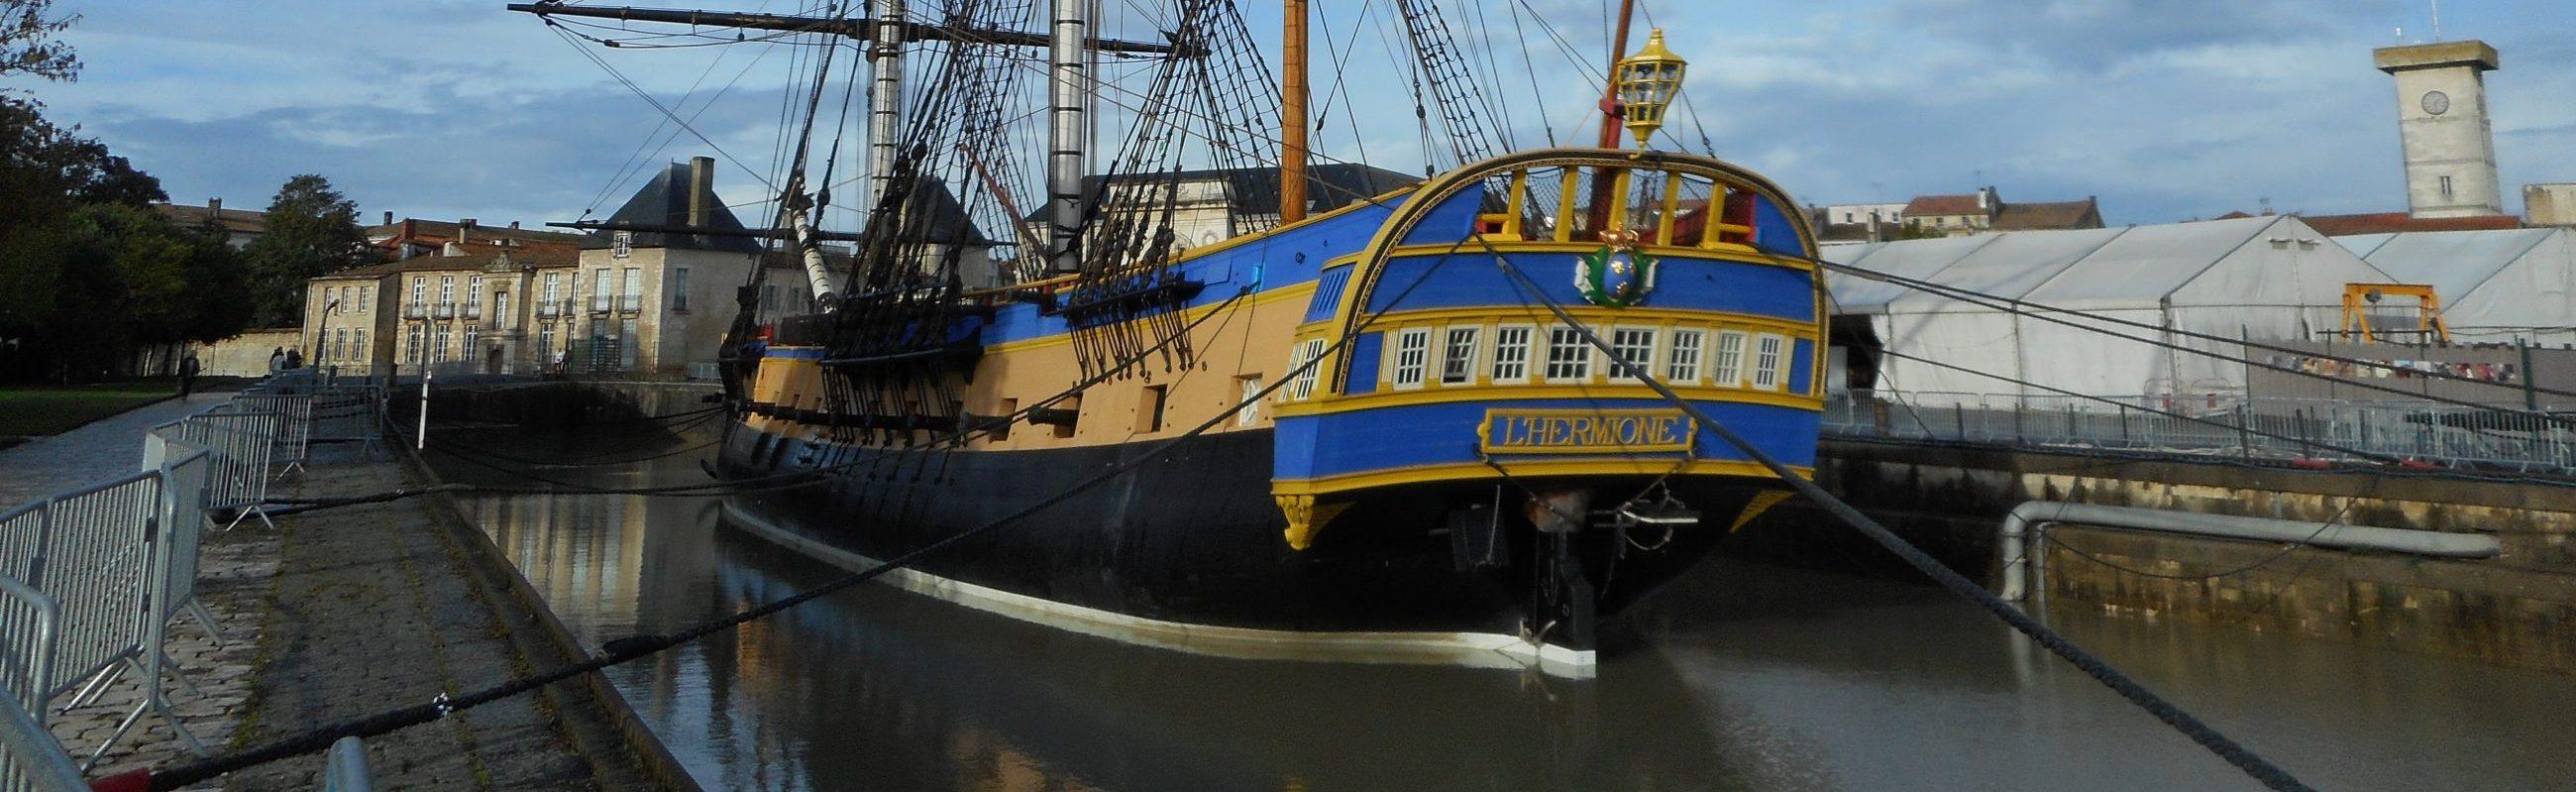 escale-fregate-hermione-a-port-vendres_catamaran-navivoile